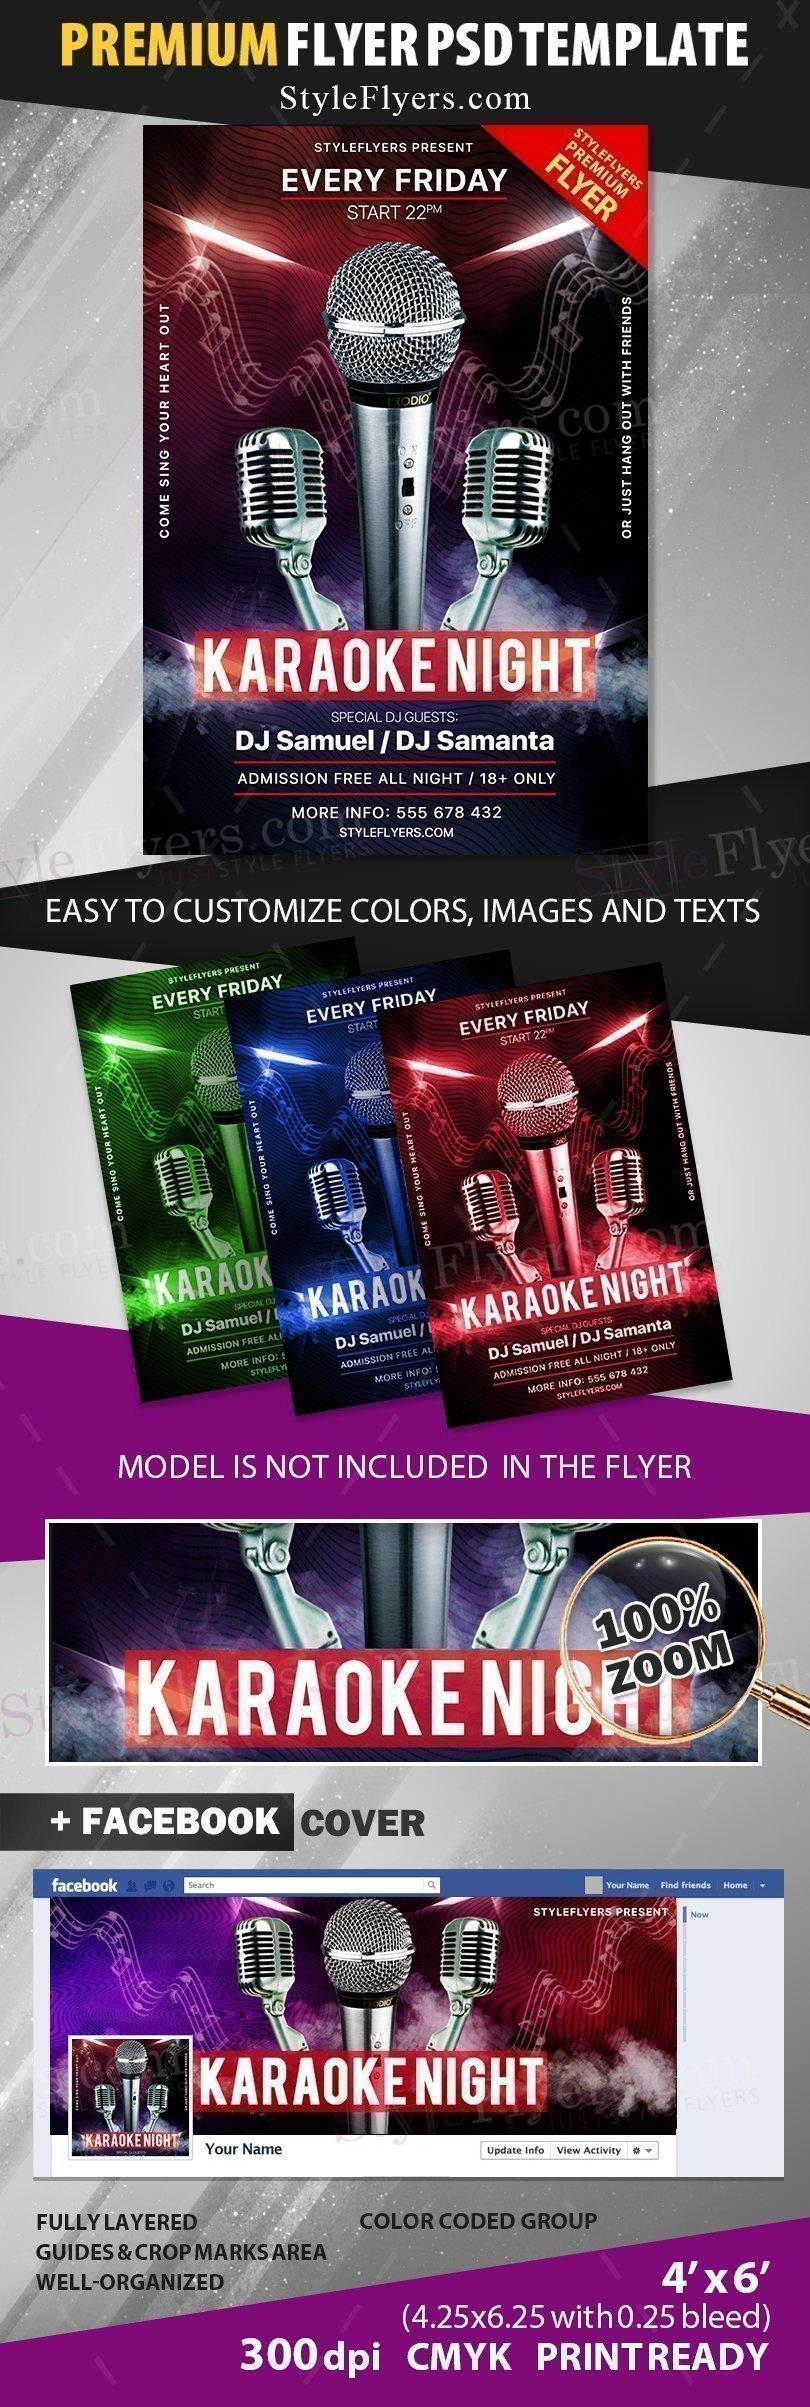 preview_karaoke-night_psd_flyer